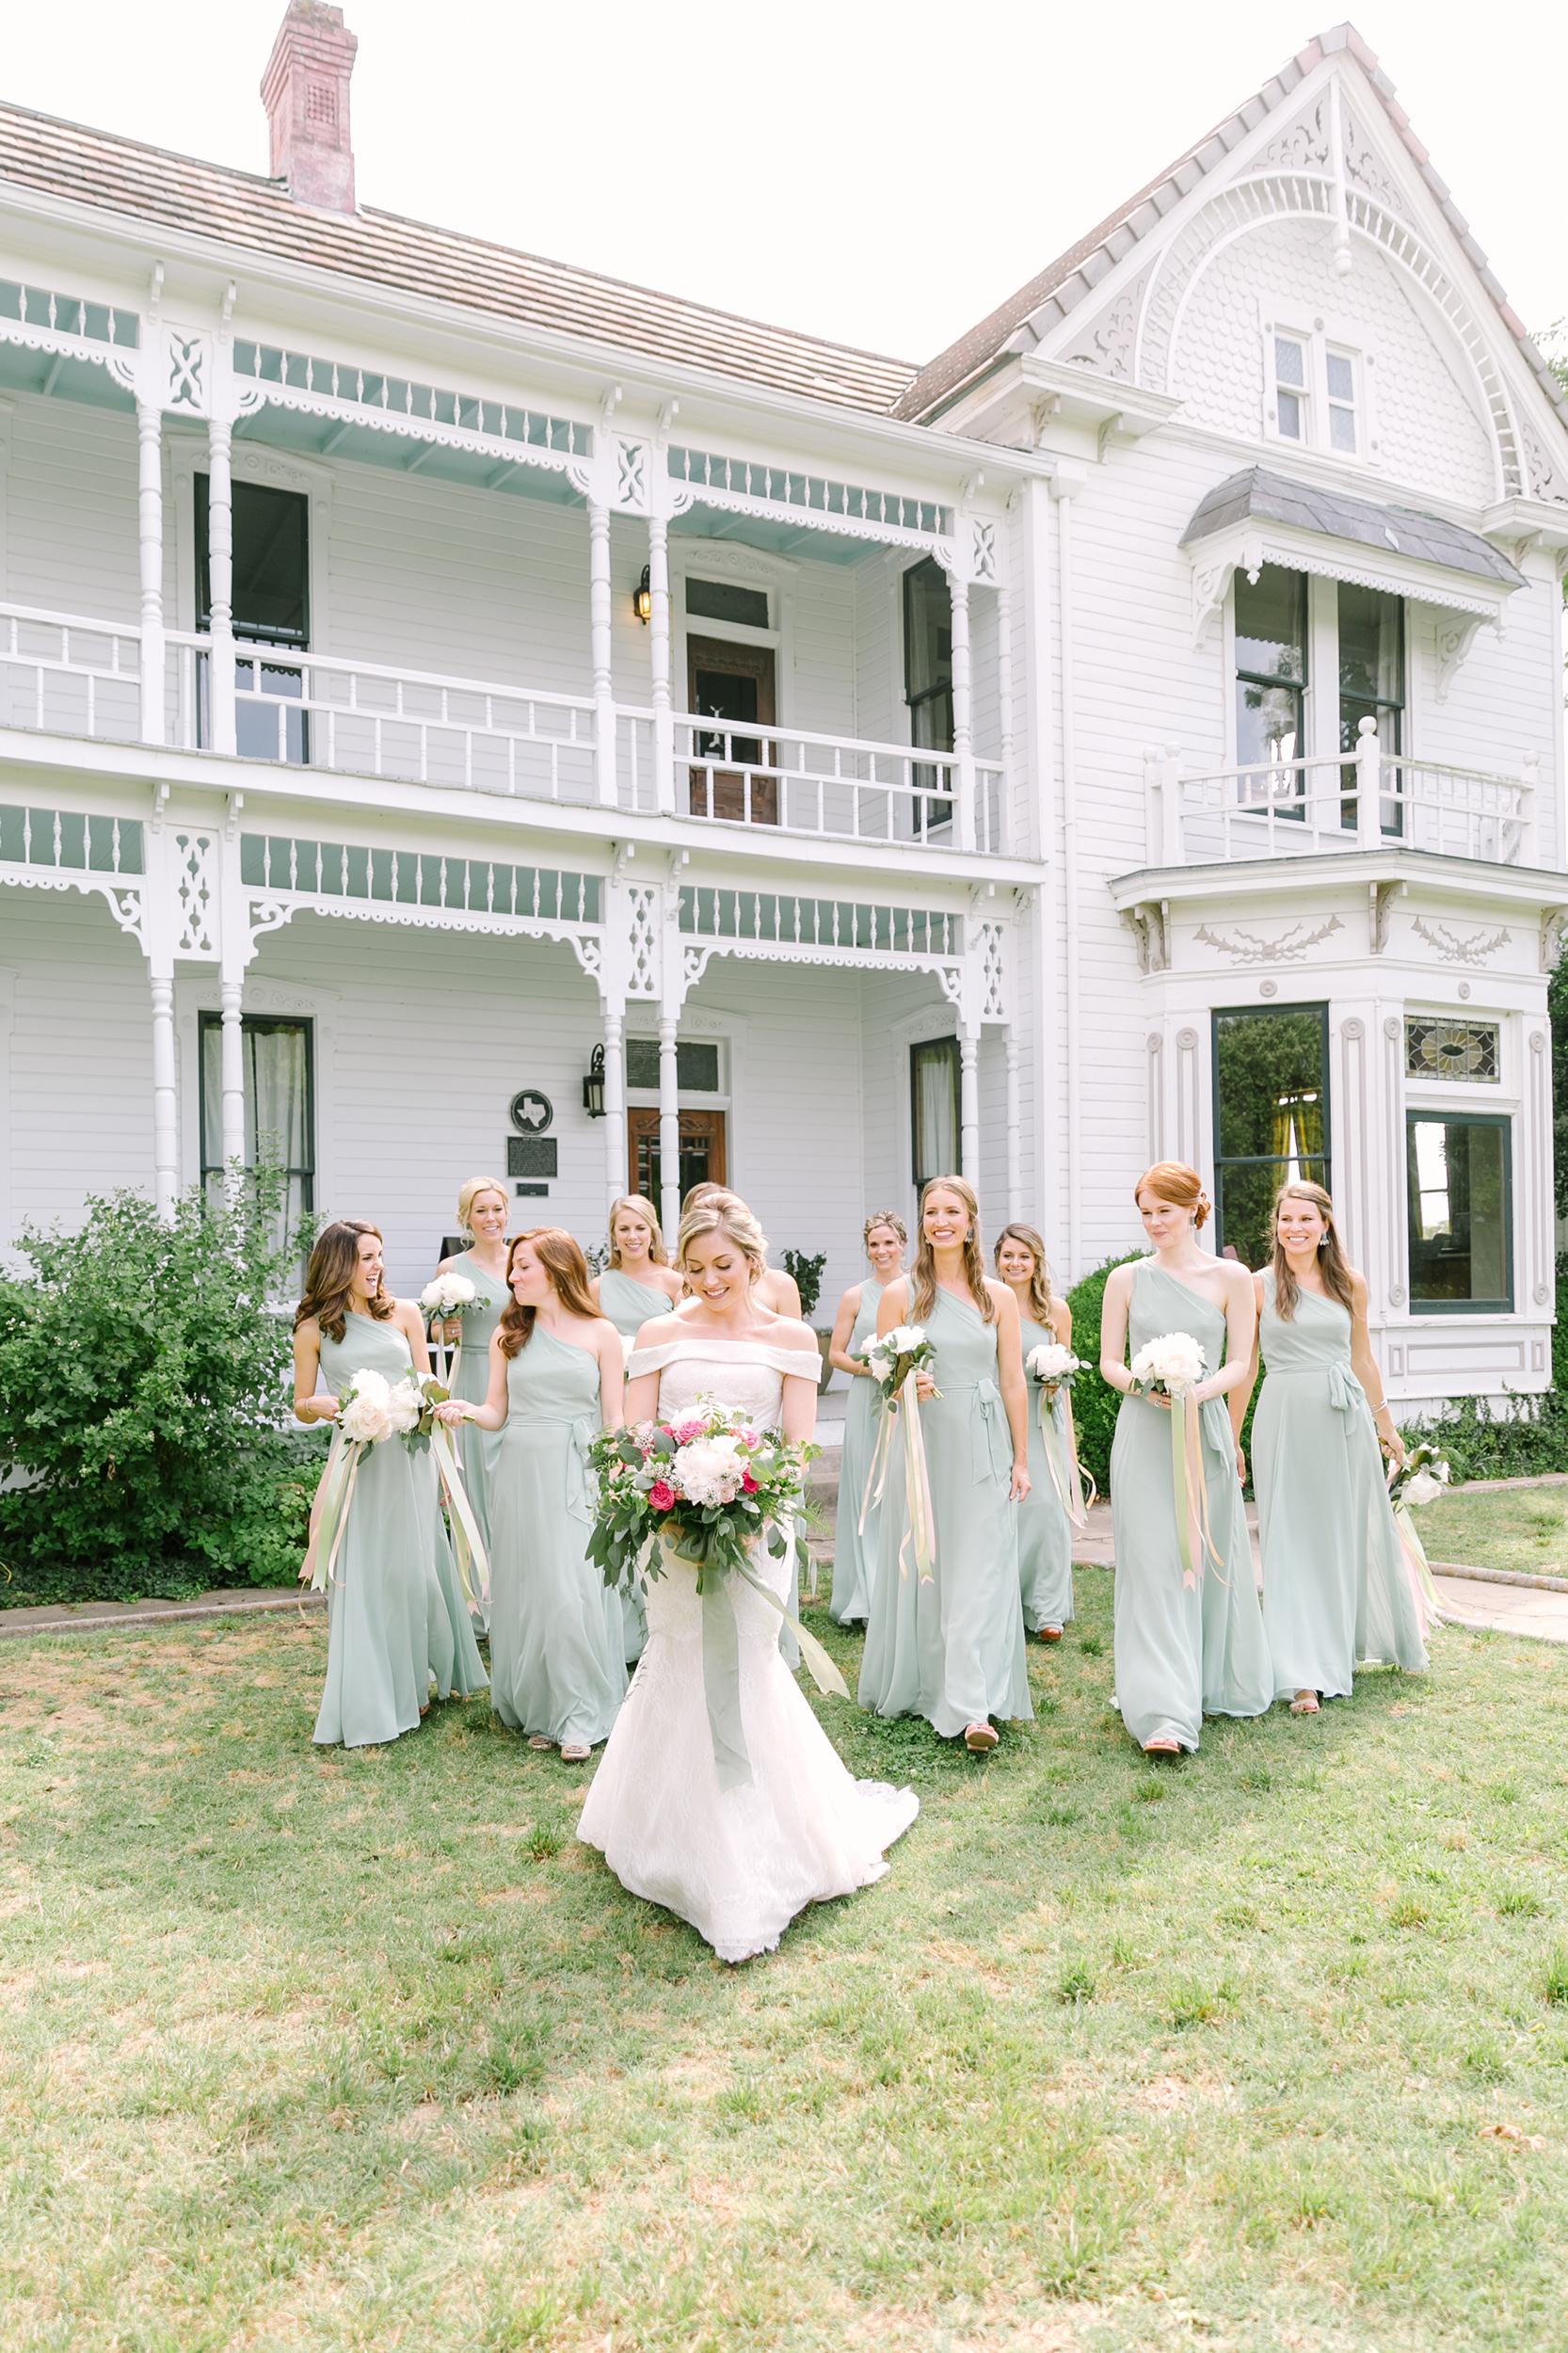 Austin_Wedding_Photographer_Kimberly_Brooke_Photographic_128.jpg